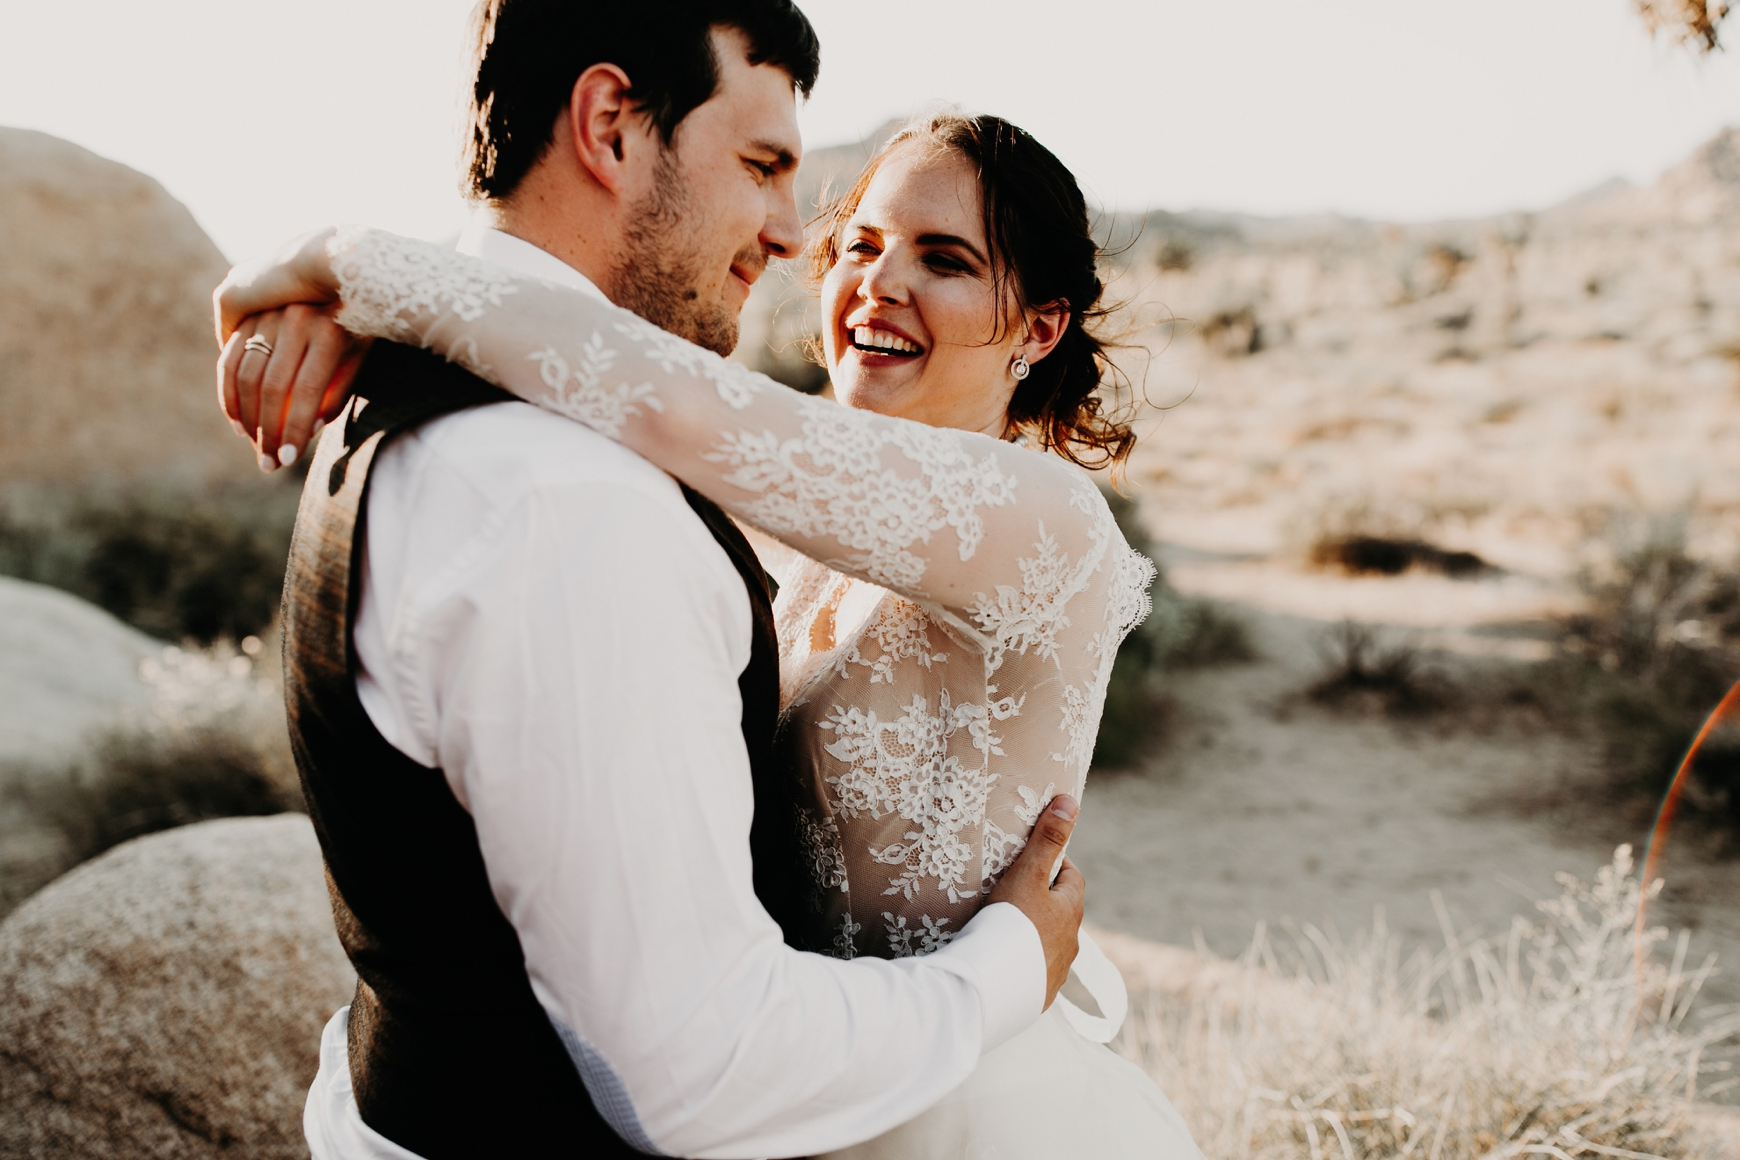 Joshua Tree Bridal Portraits Anastasia & Andrey Emily Magers Photography-154.jpg